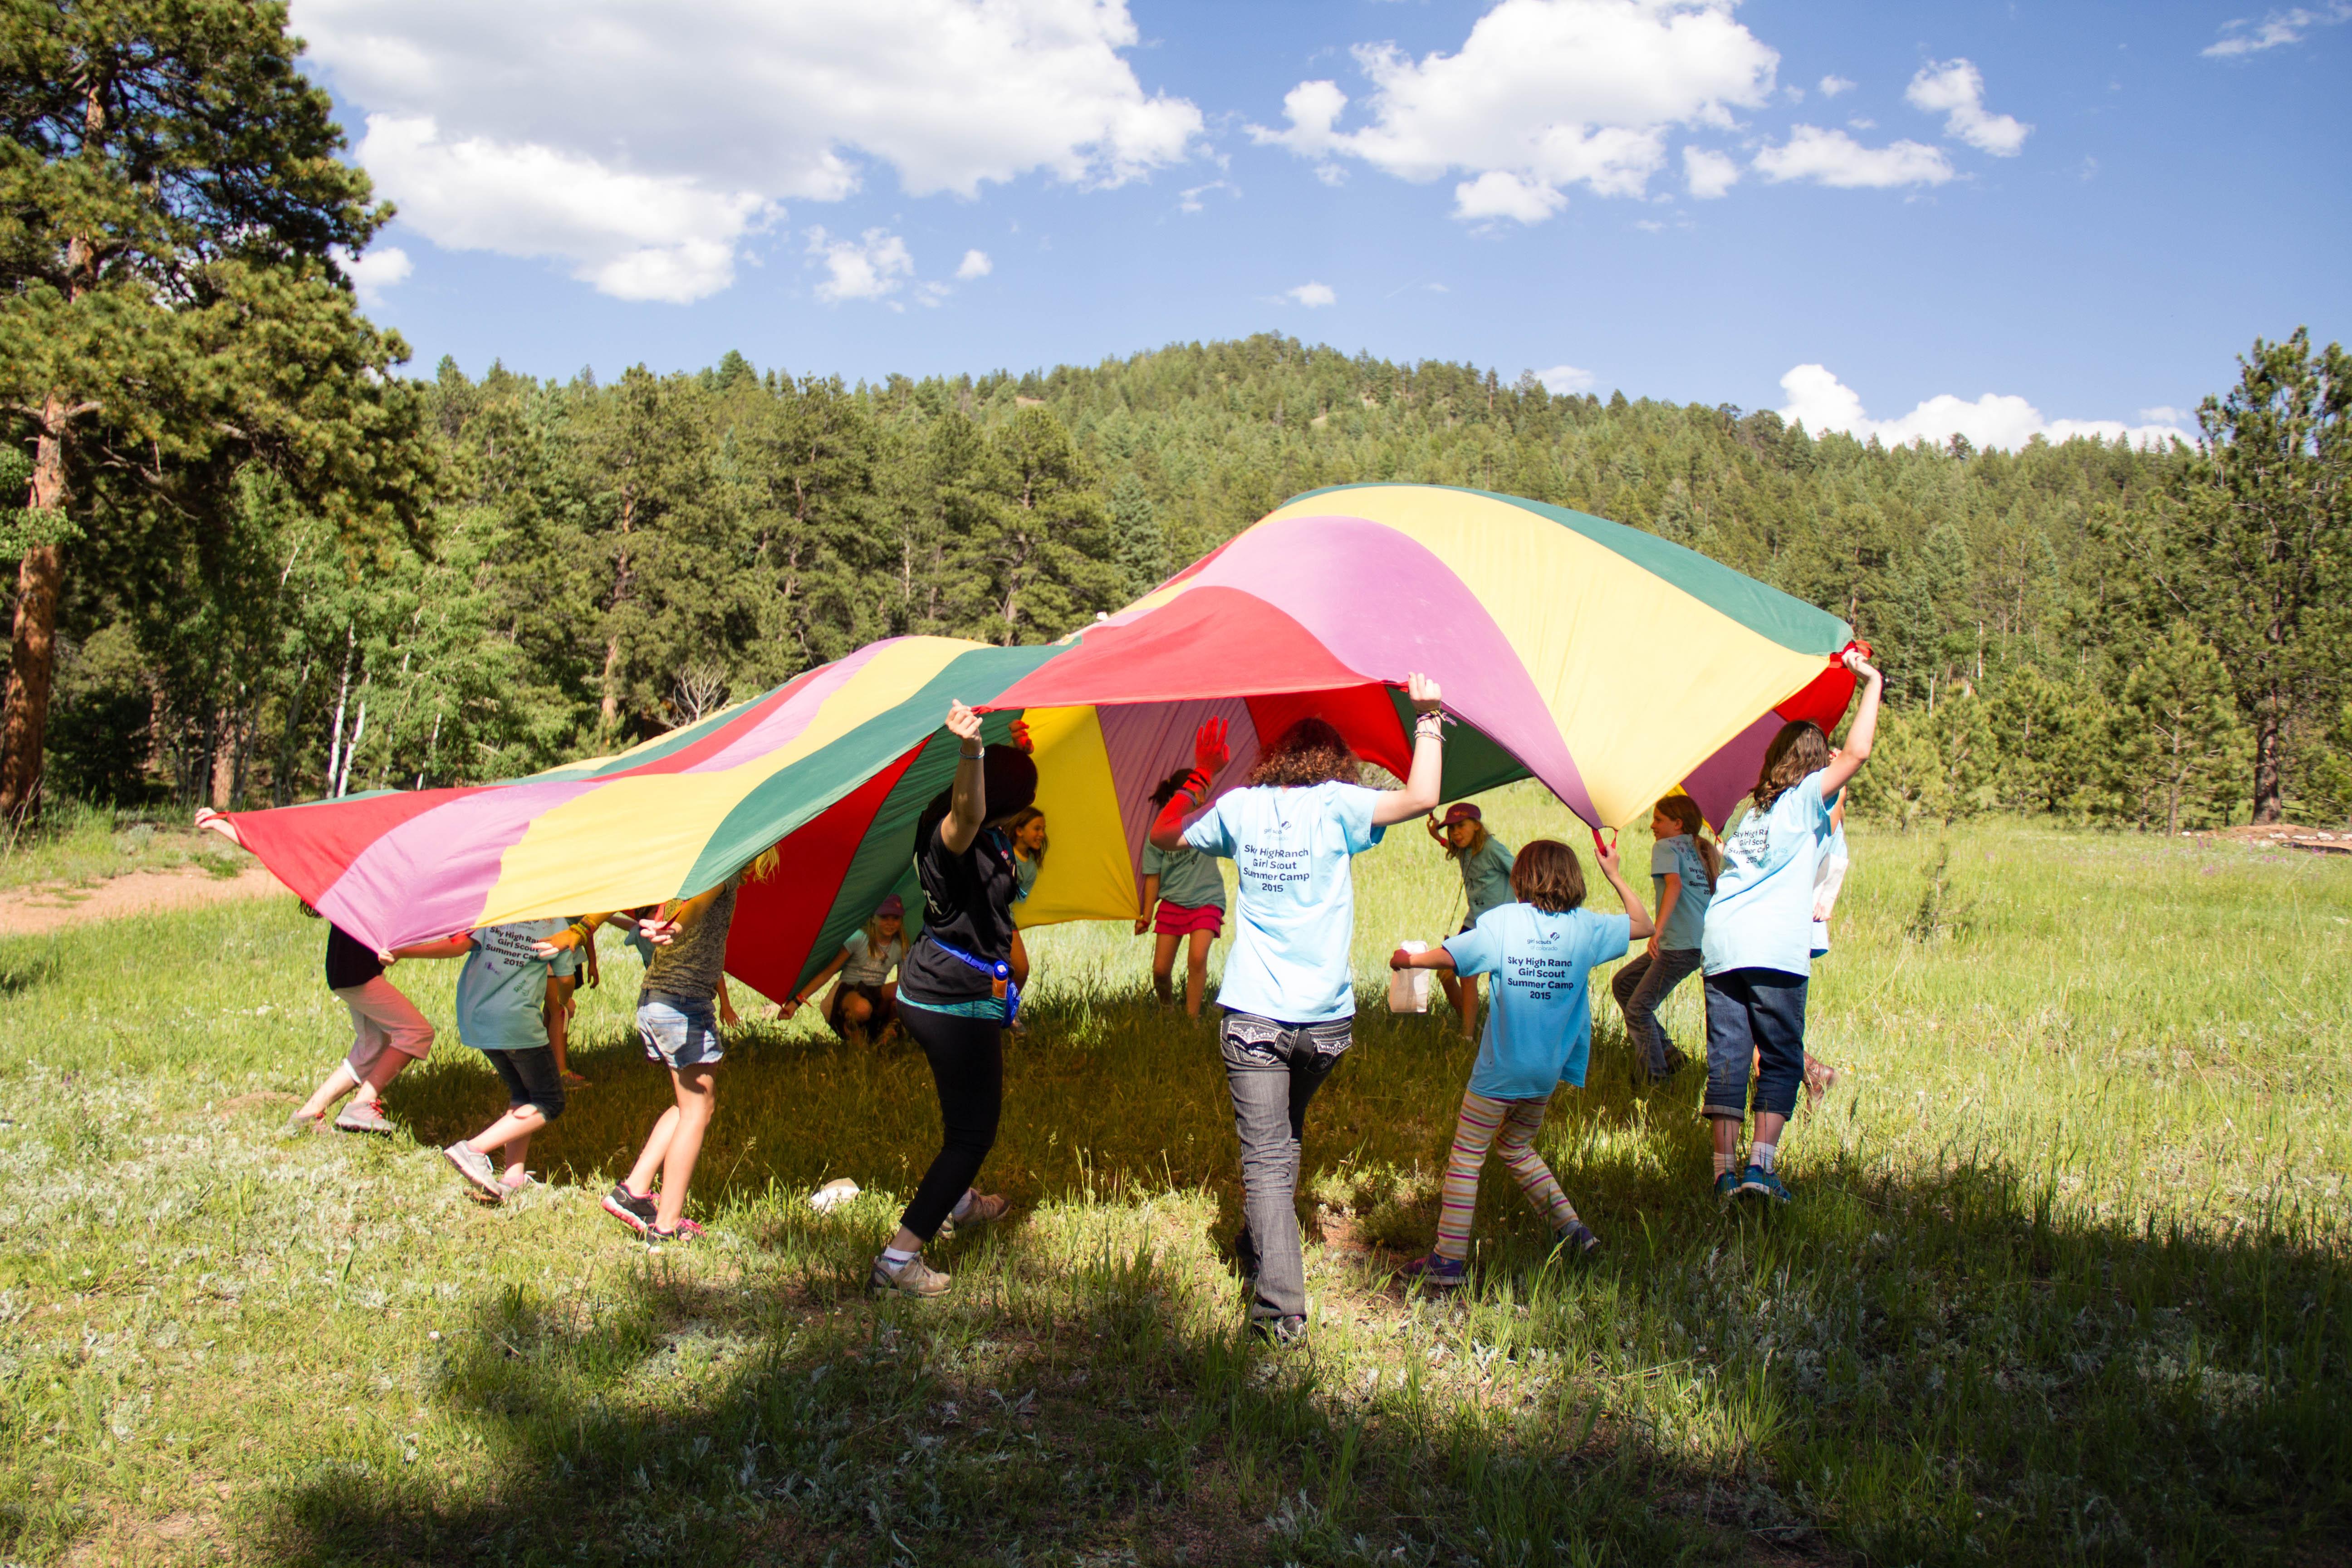 camping essay